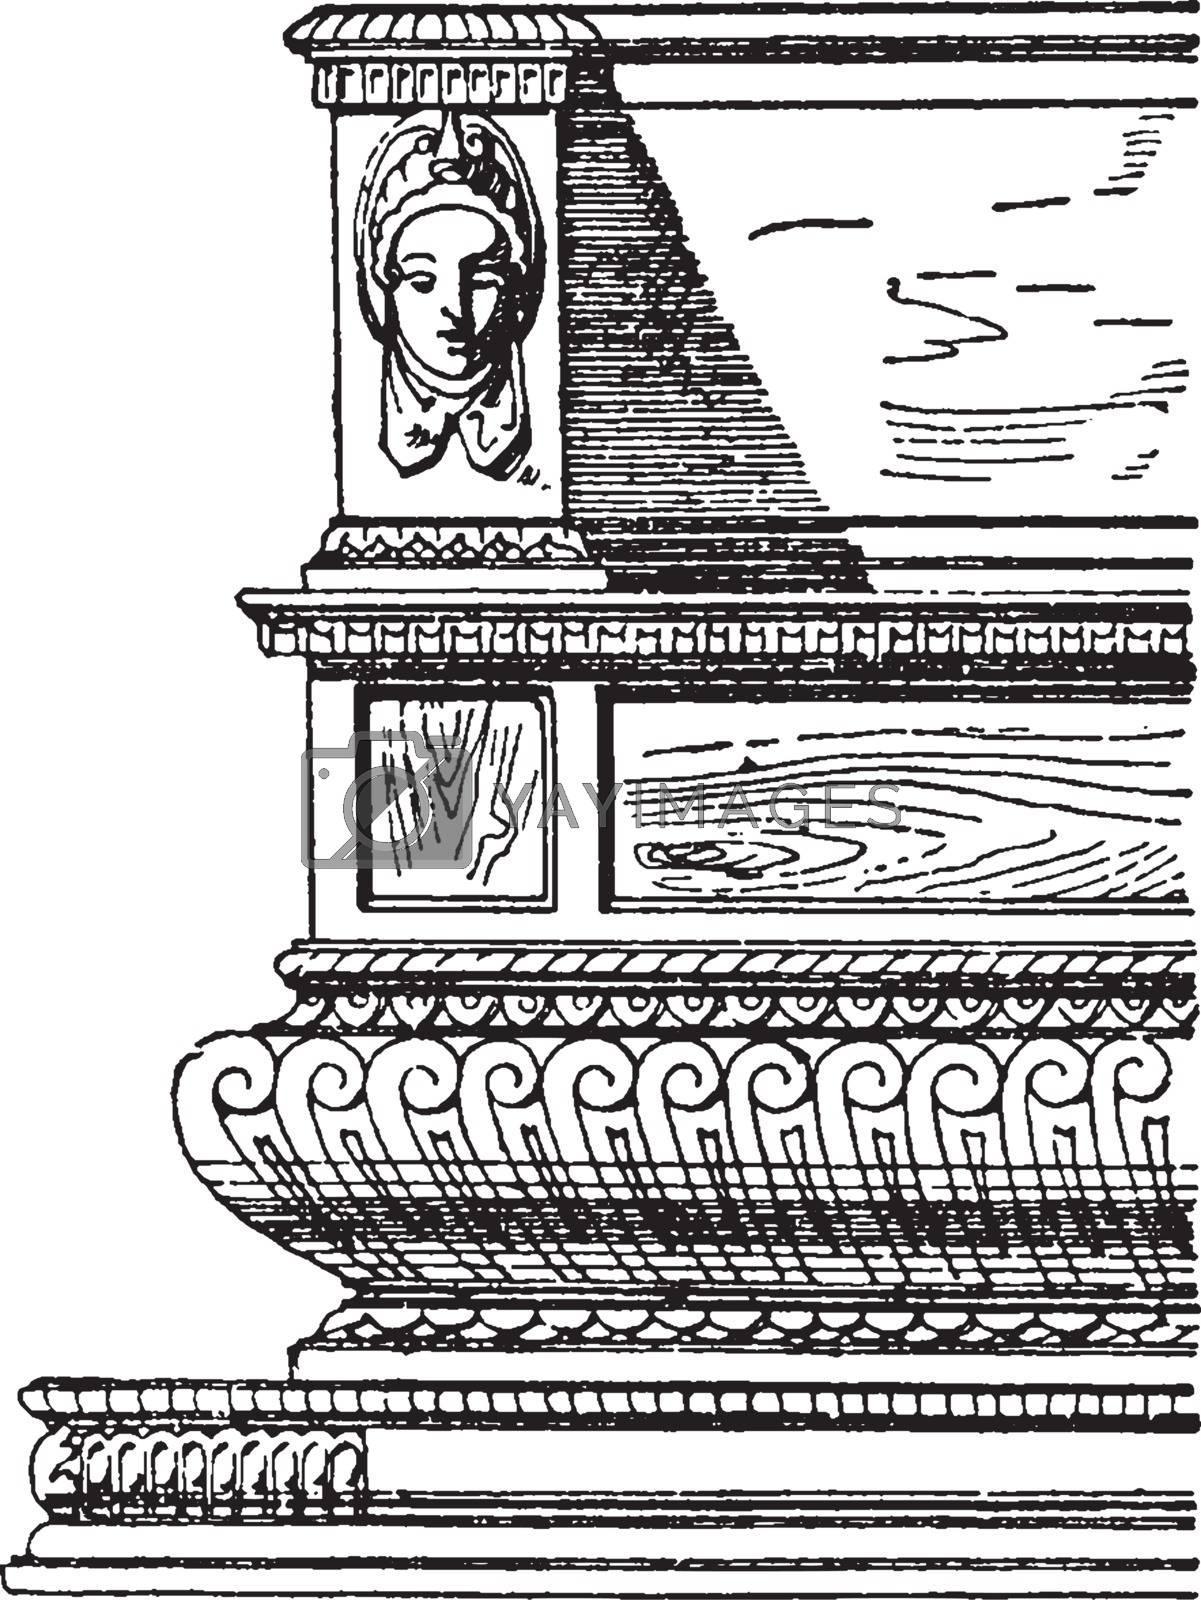 Renaissance Bench, vintage illustration by Morphart